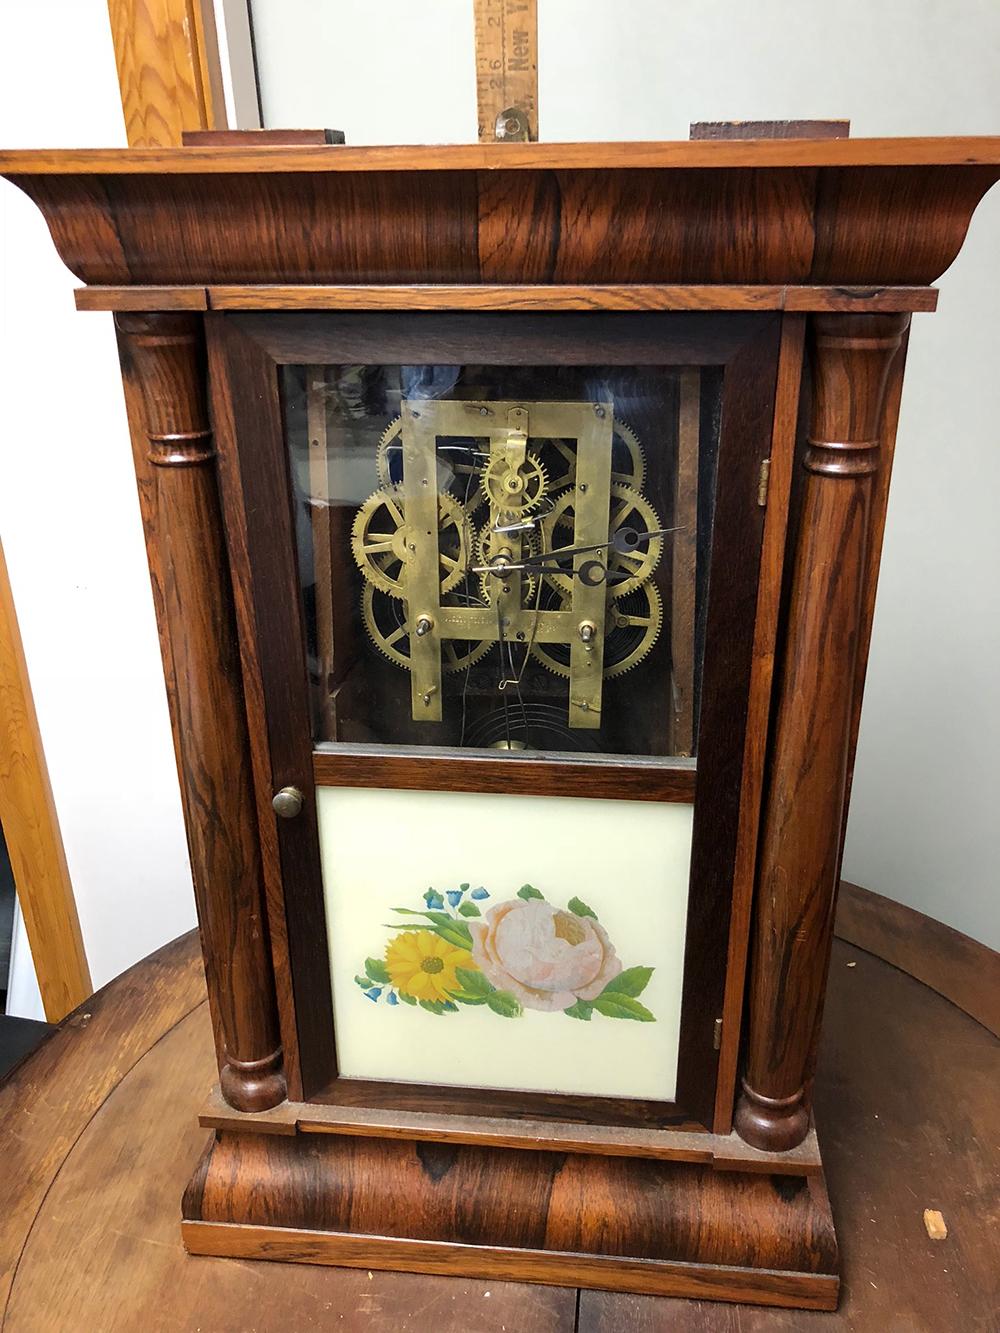 E.N. Welch Mantel Clock